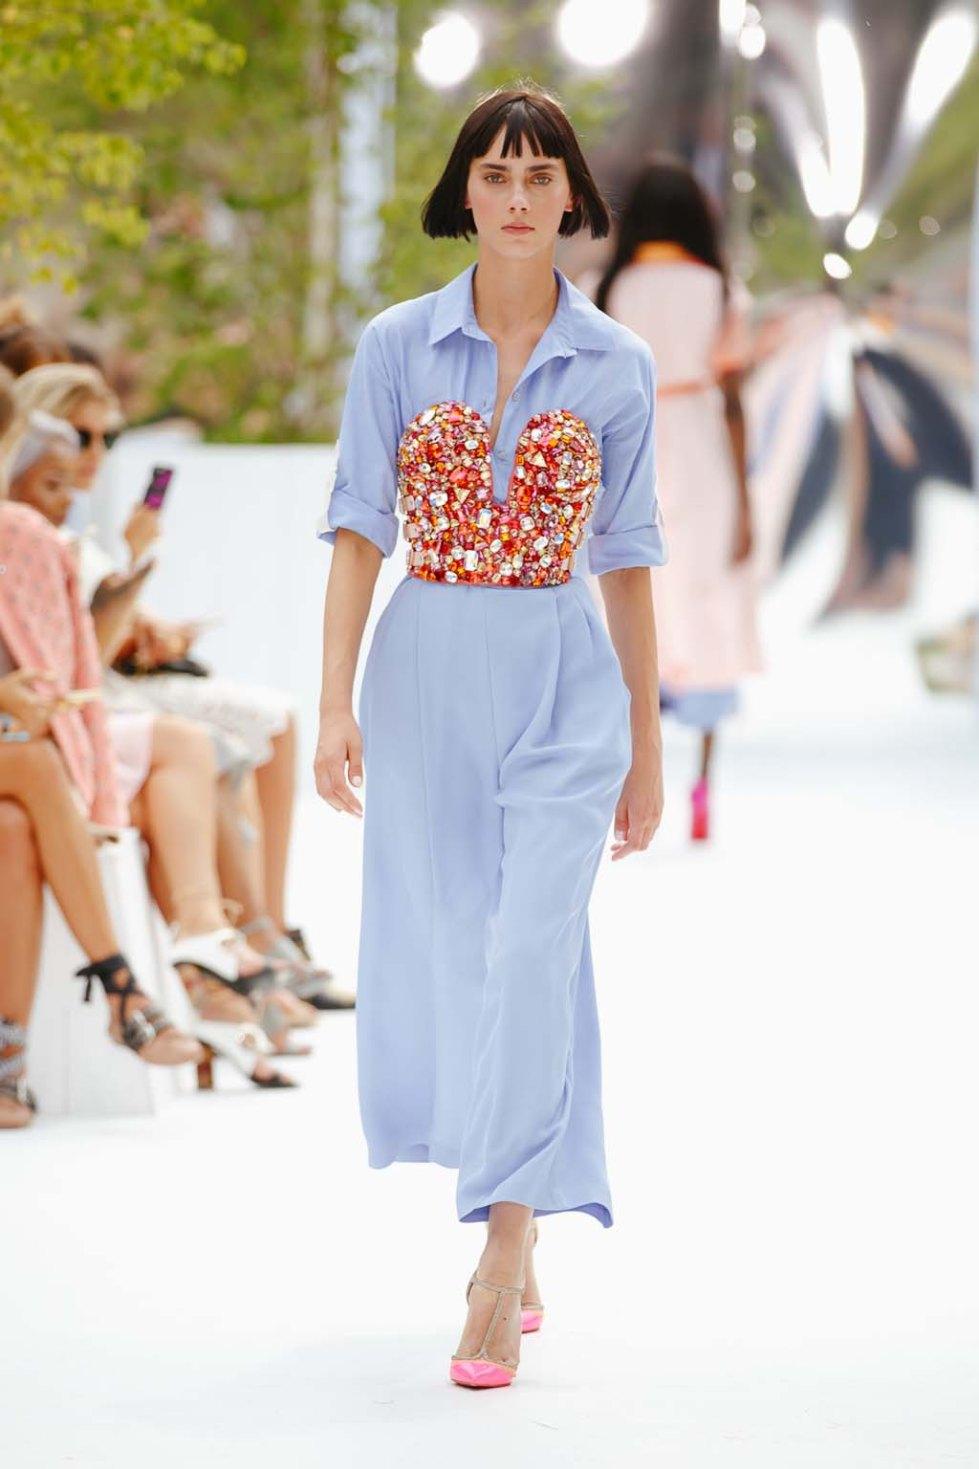 Marina-Hoermanseder -spring-2017-collection-slashitmag-fashion-3